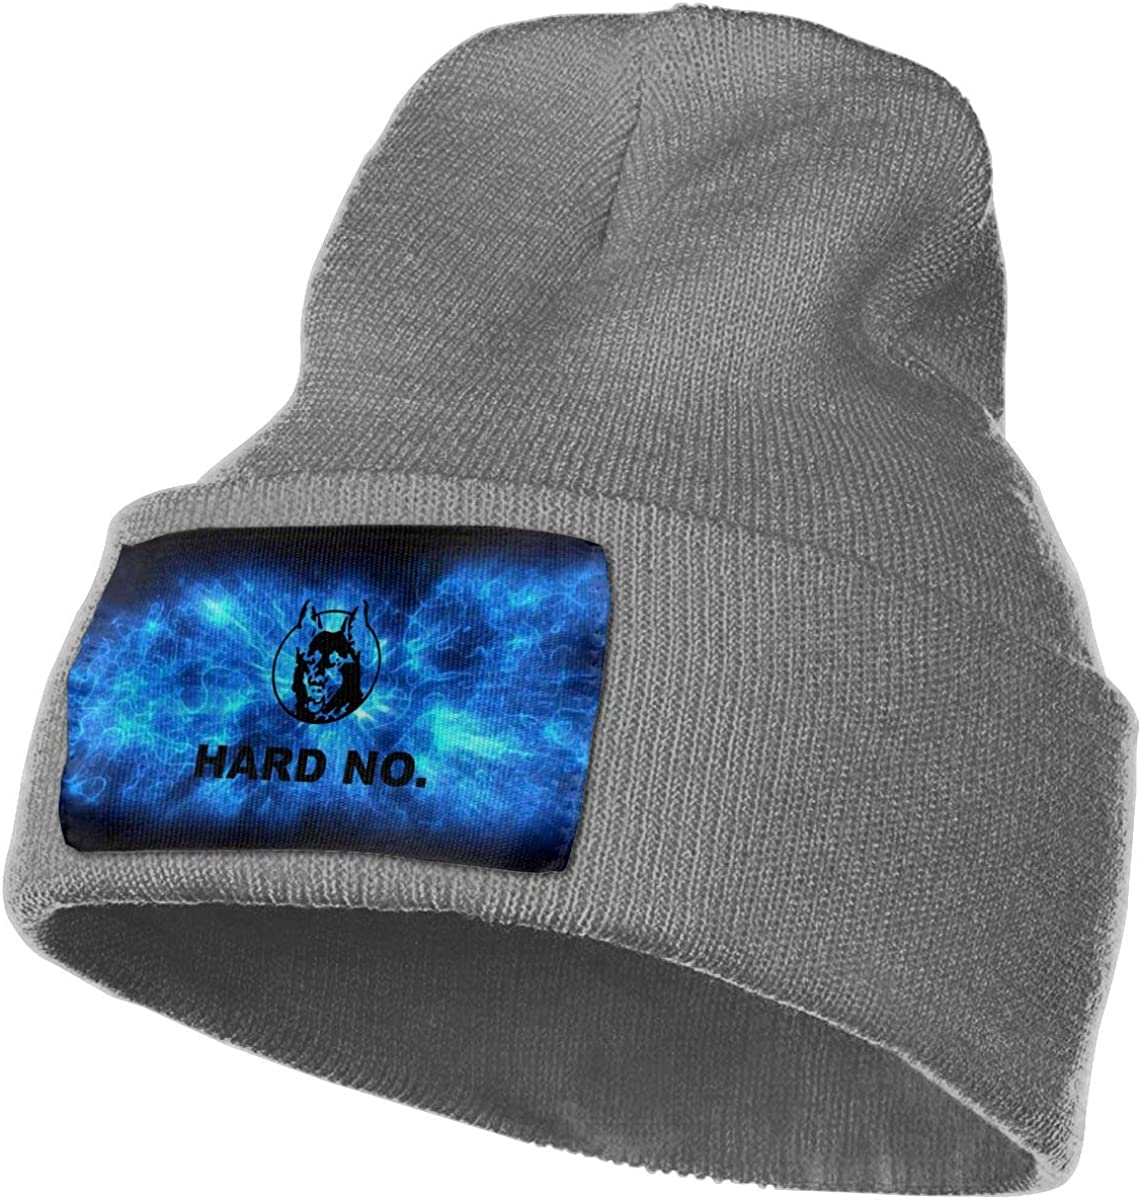 Hard No Letterkenny Winter Beanie Hat Knit Hat Cap for for Men /& Women